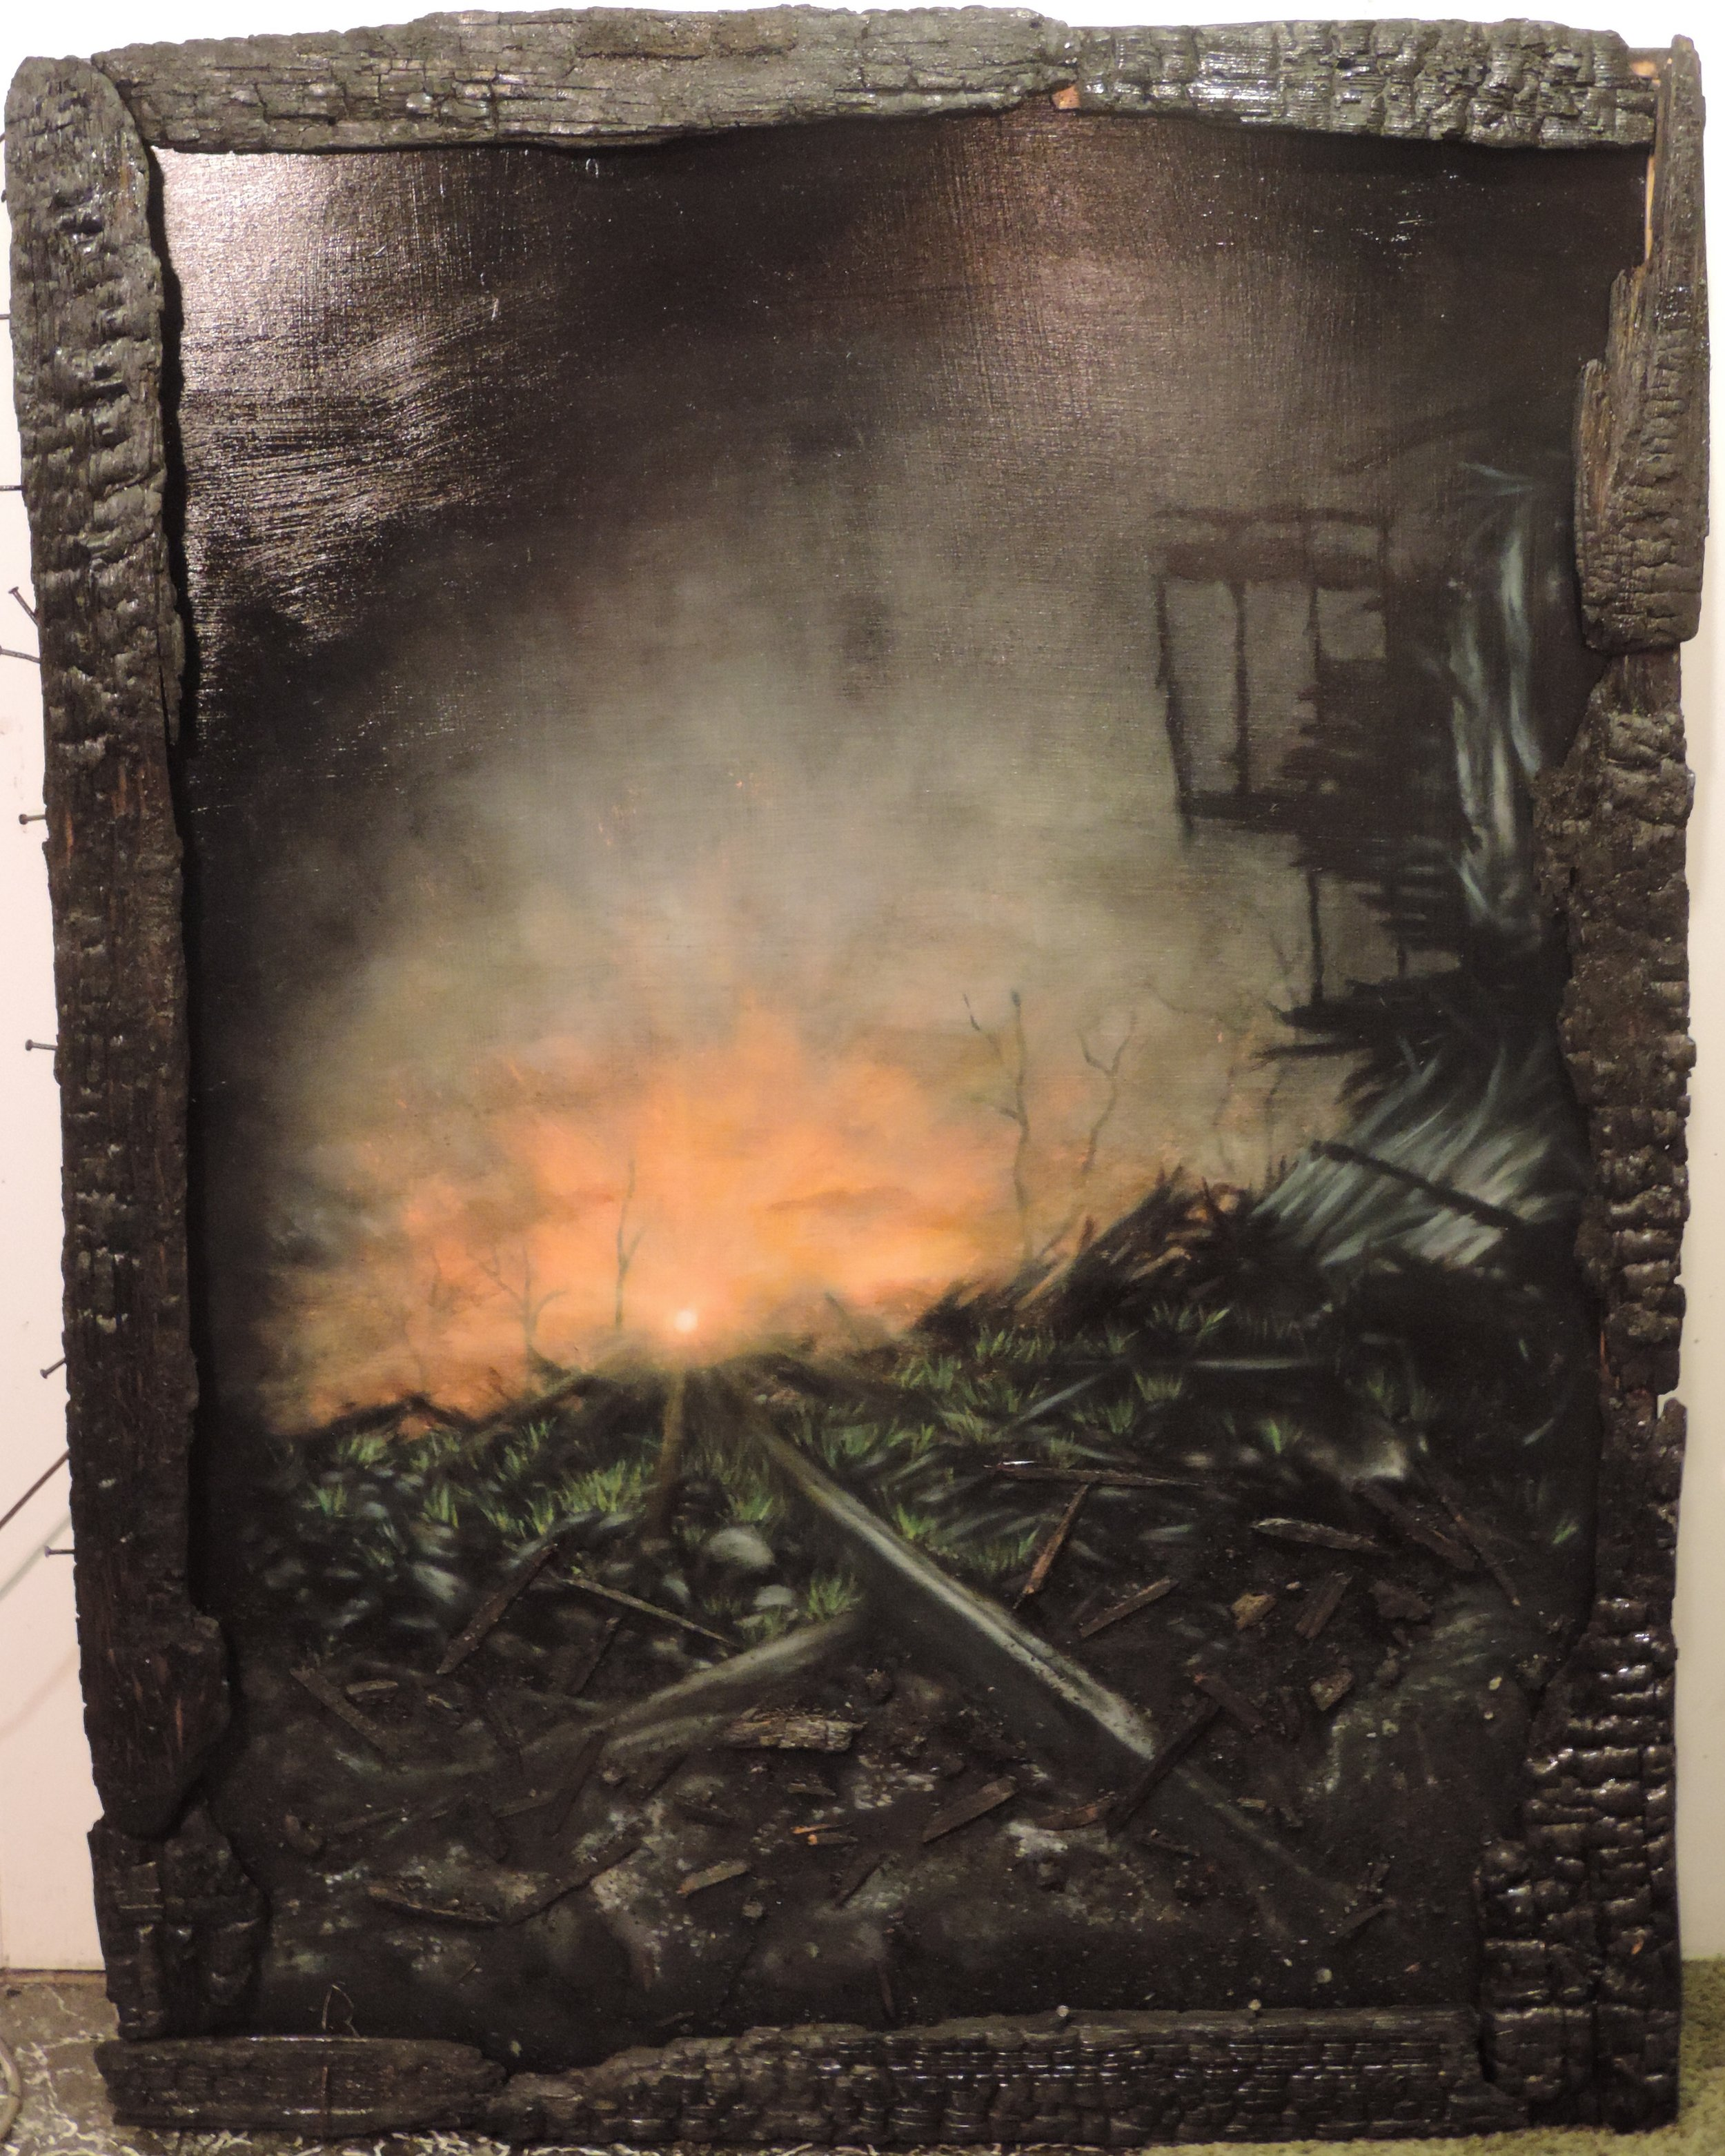 Resurget Cineribus, 2015. Oil on panel. 4ft x 3ft